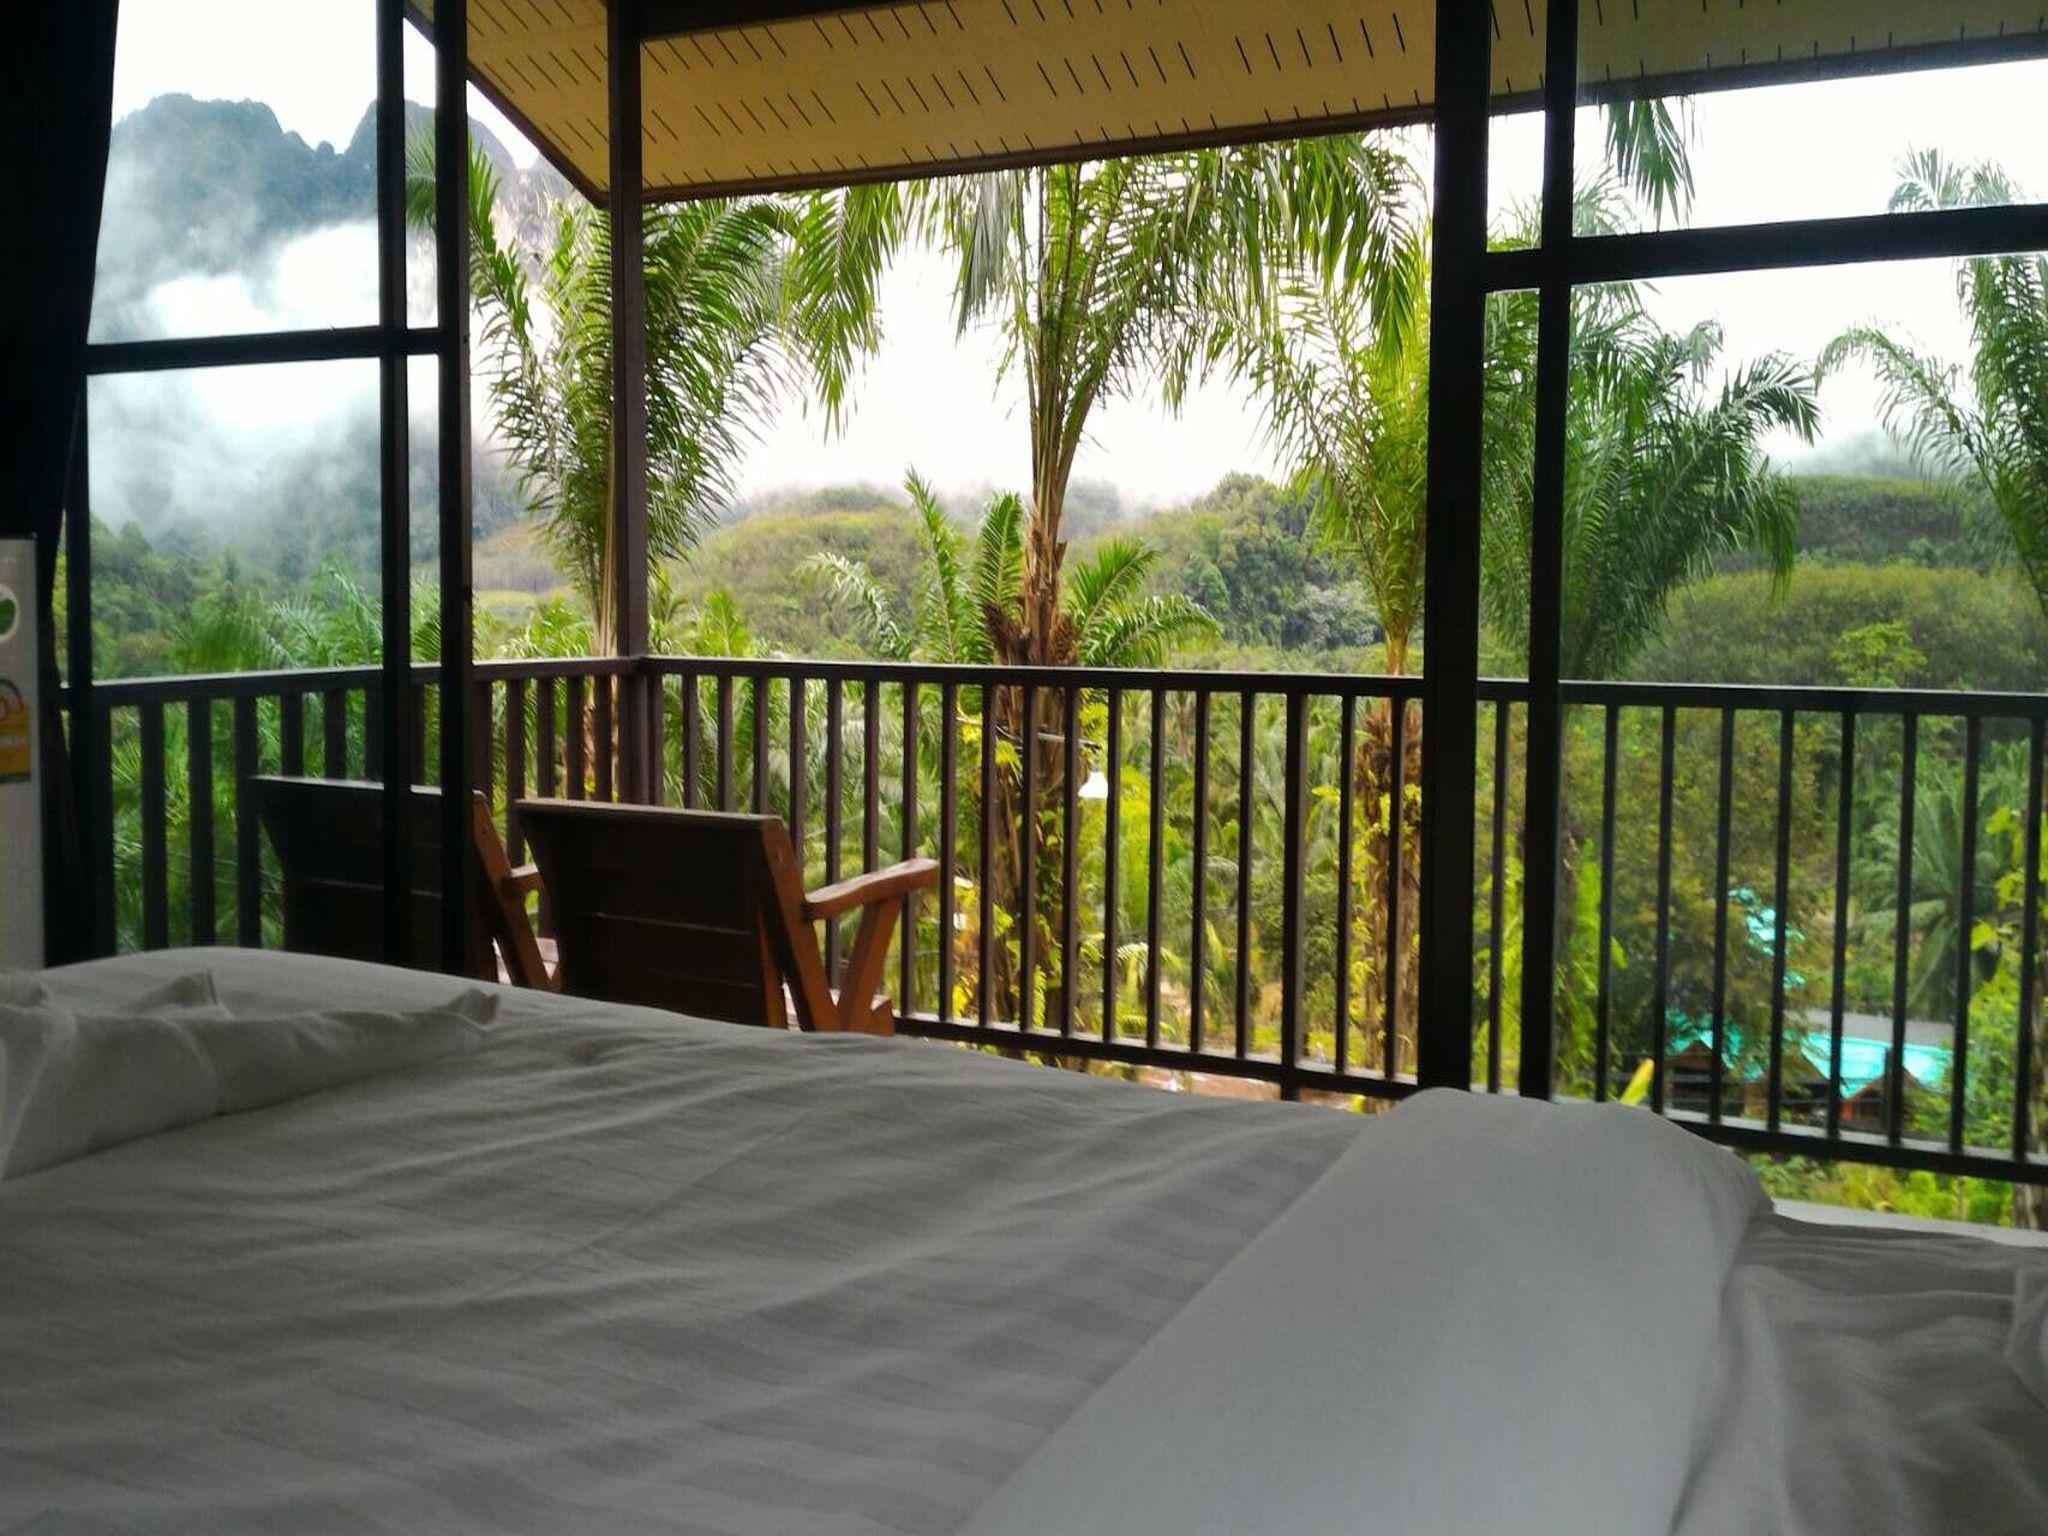 horizon khao sok resort,ฮอไรซัน เขาสก รีสอร์ต